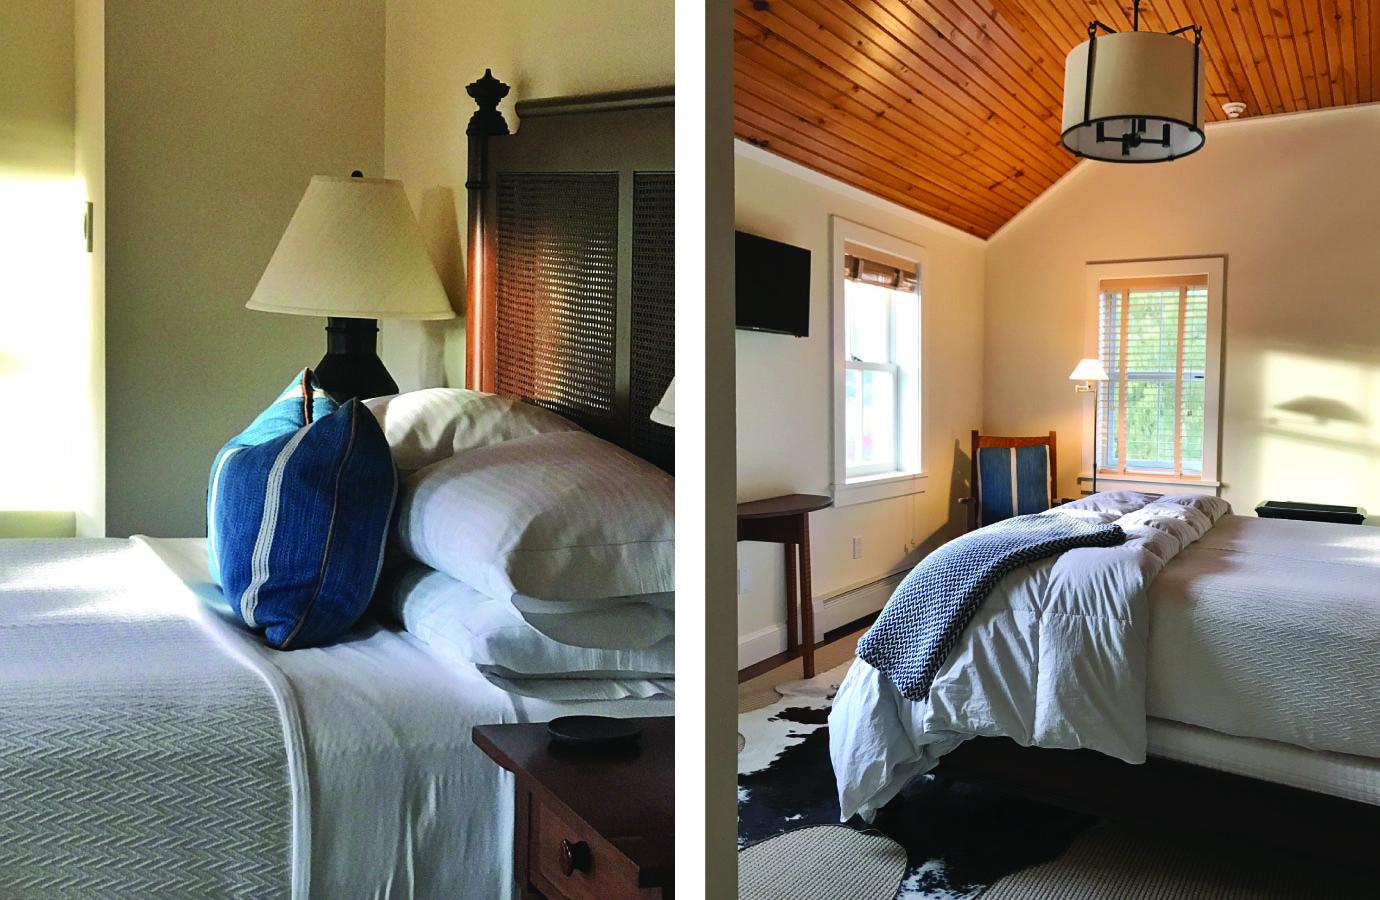 Hill Farm Inn Room Details.jpg